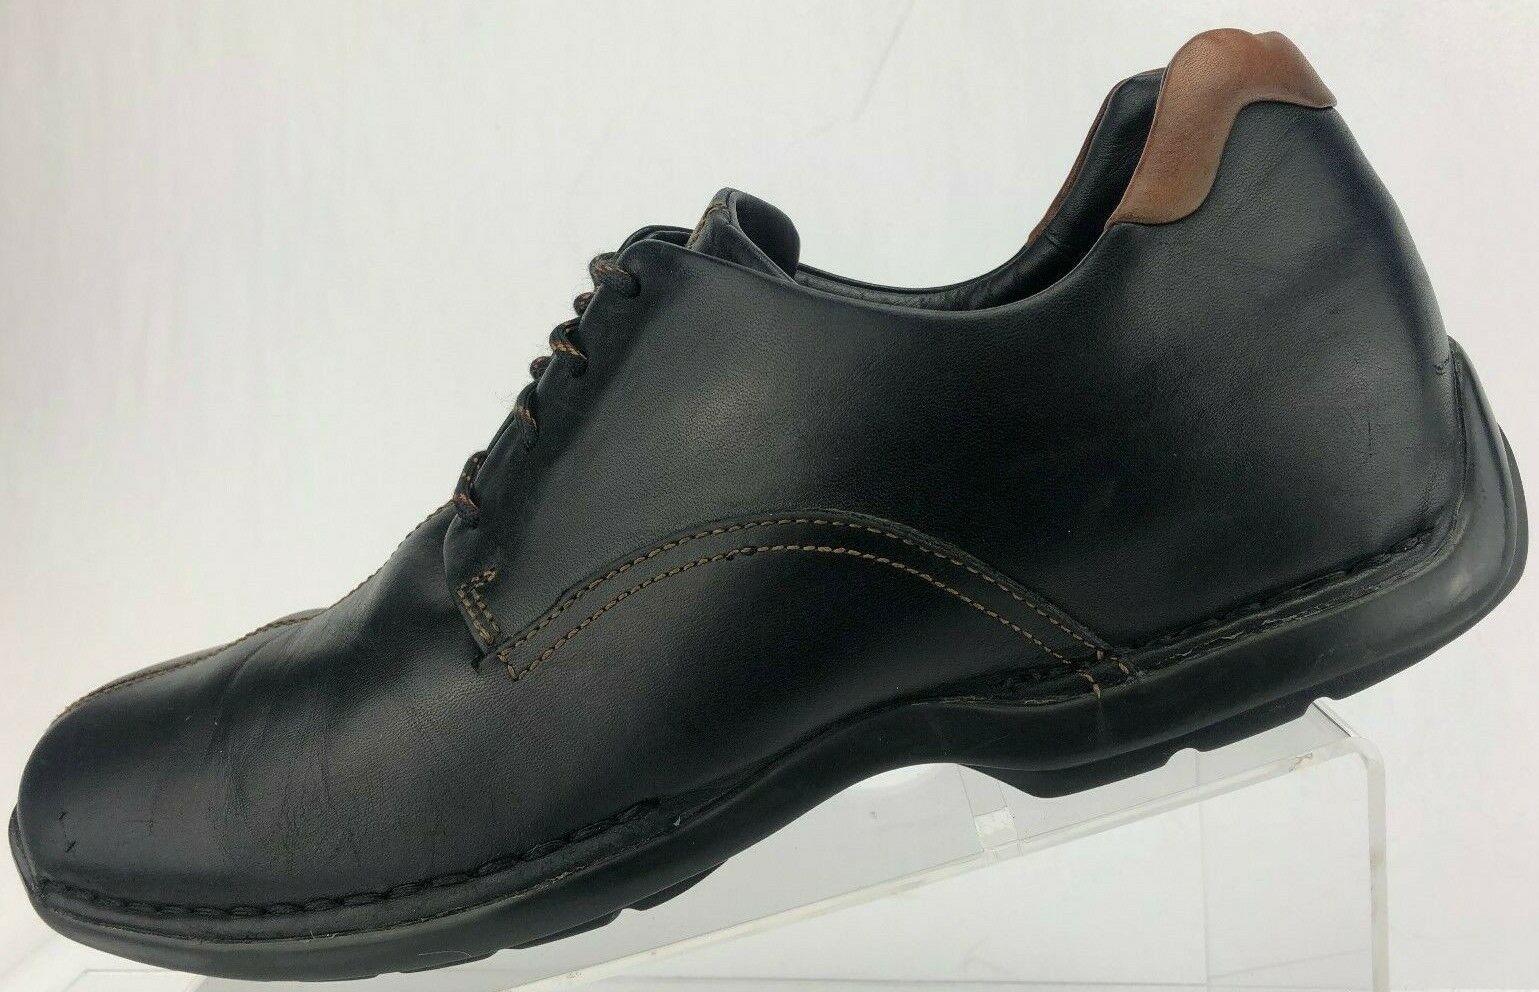 Cole Haan Zeno Lace Up II II II Split Toe nero Casual Leather Oxfords Uomo 10.5 M bb438a